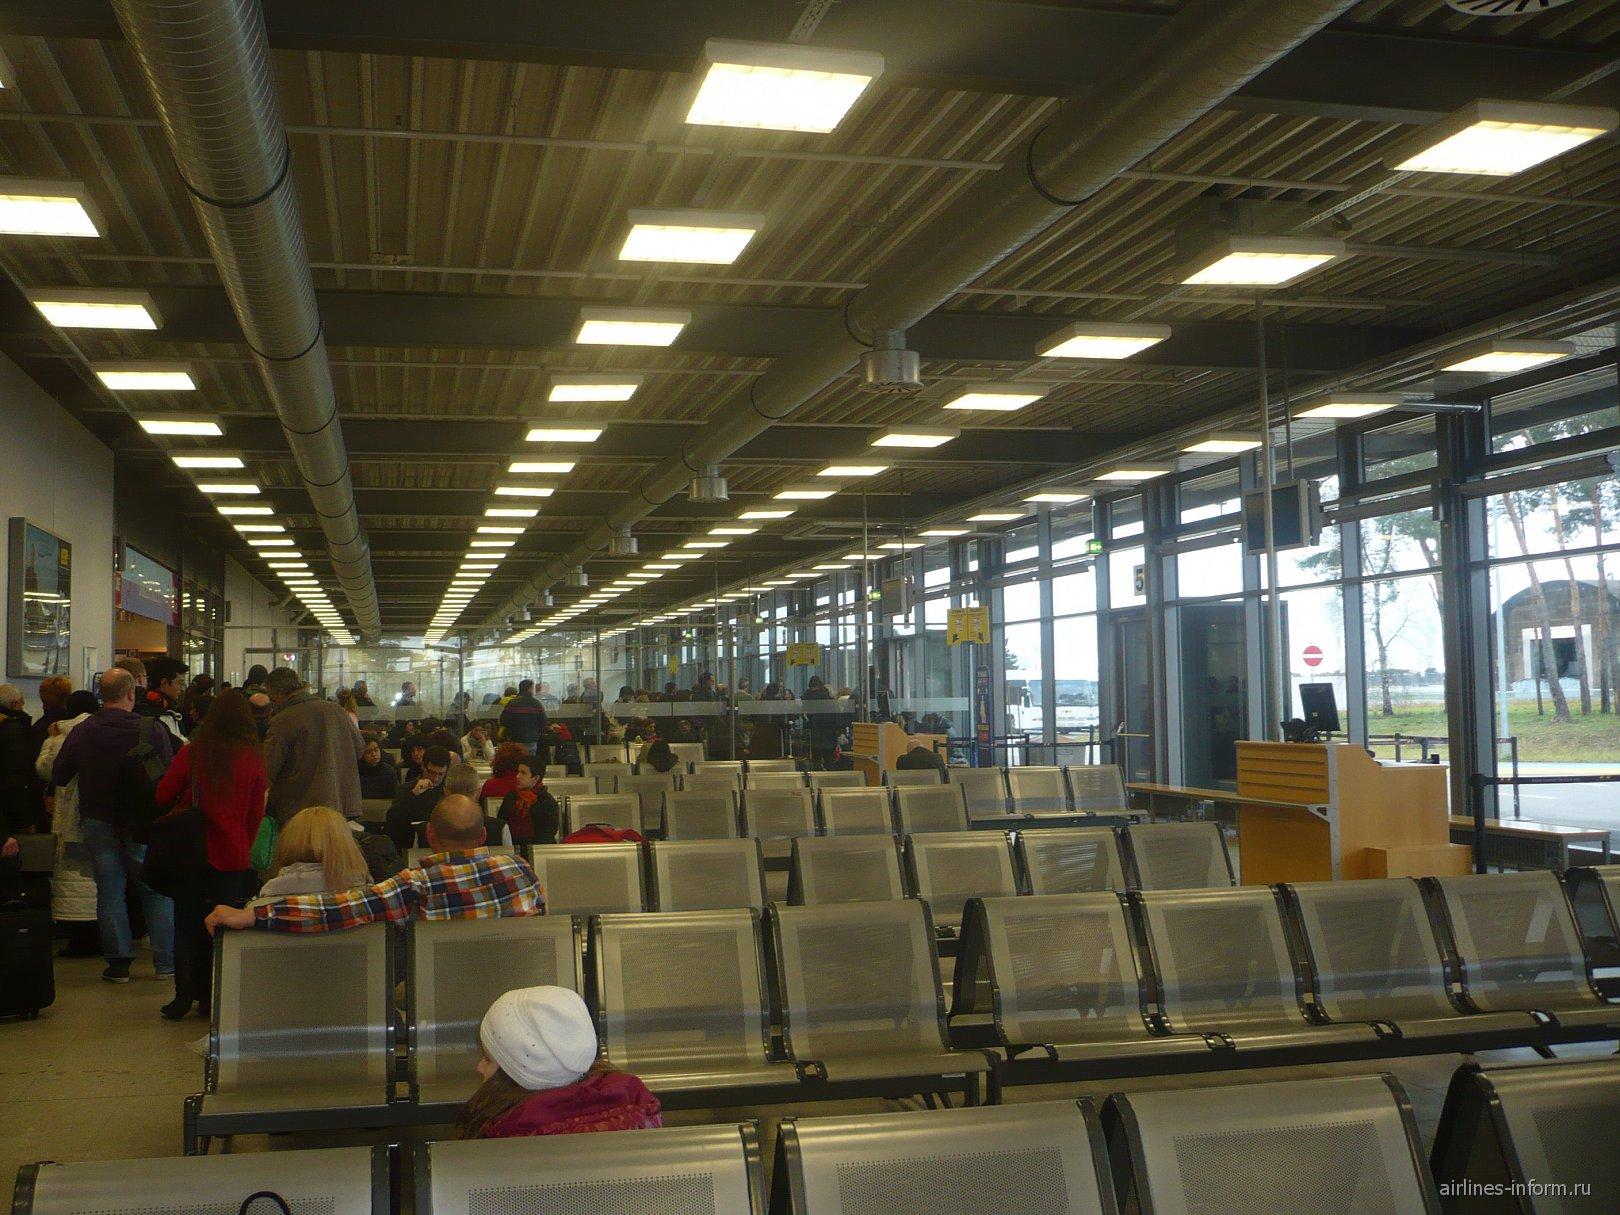 Зал ожидания в аэропорту Карлсруэ Баден-Баден